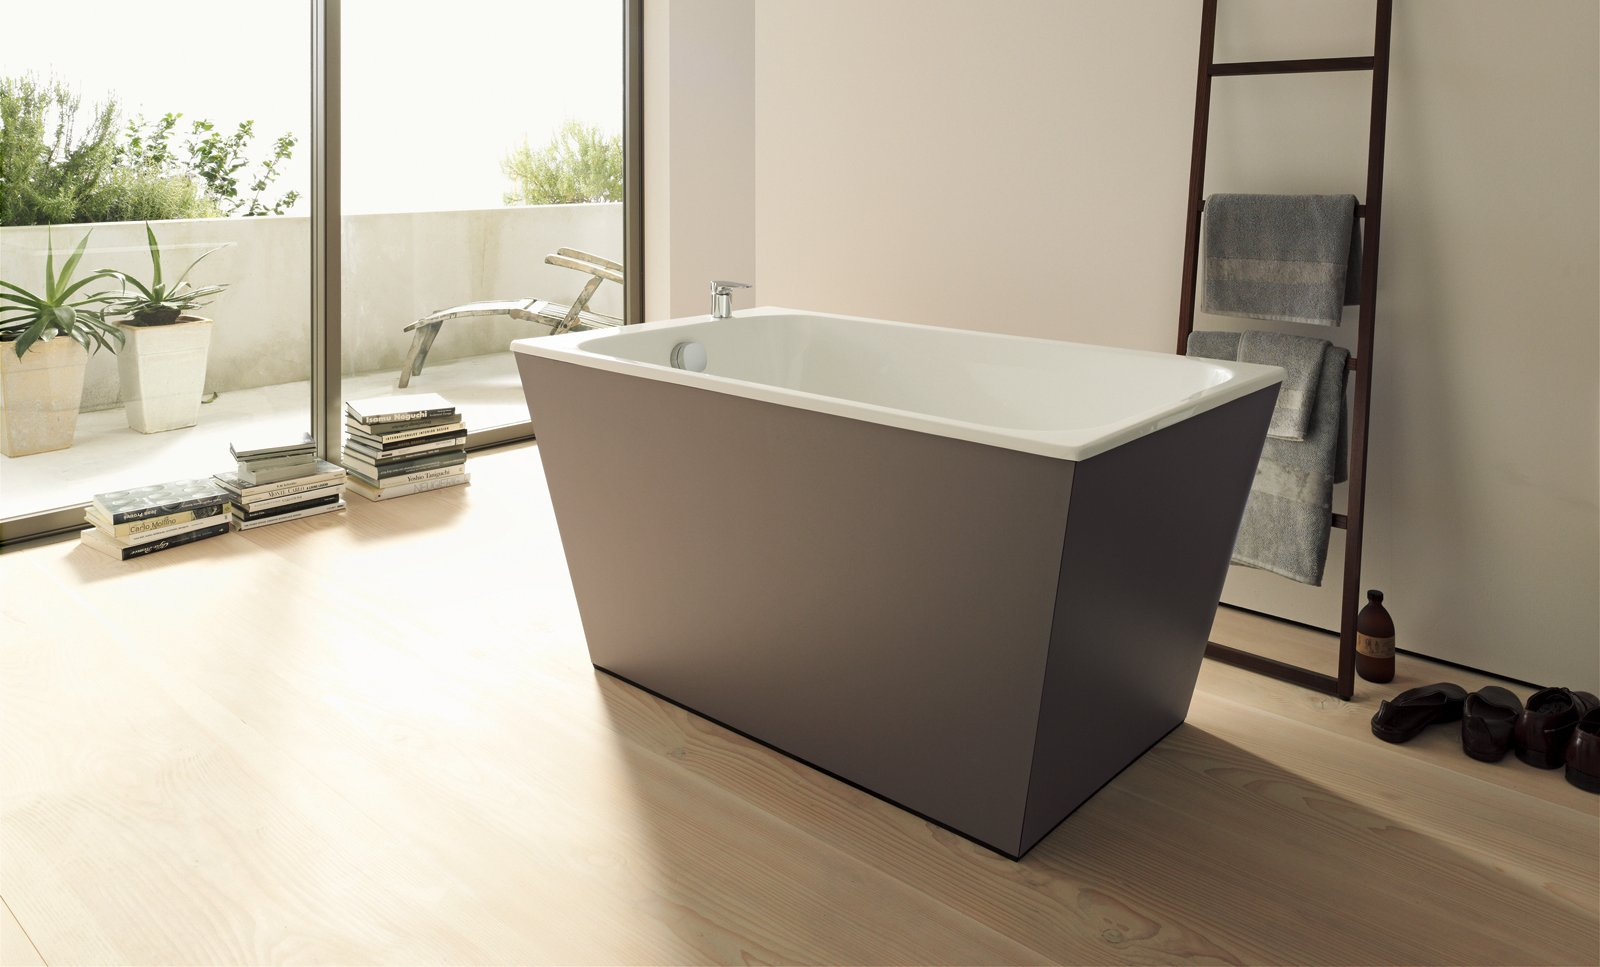 Vasca Da Bagno 120 70 Prezzi : Vasche da bagno piccole cose di casa